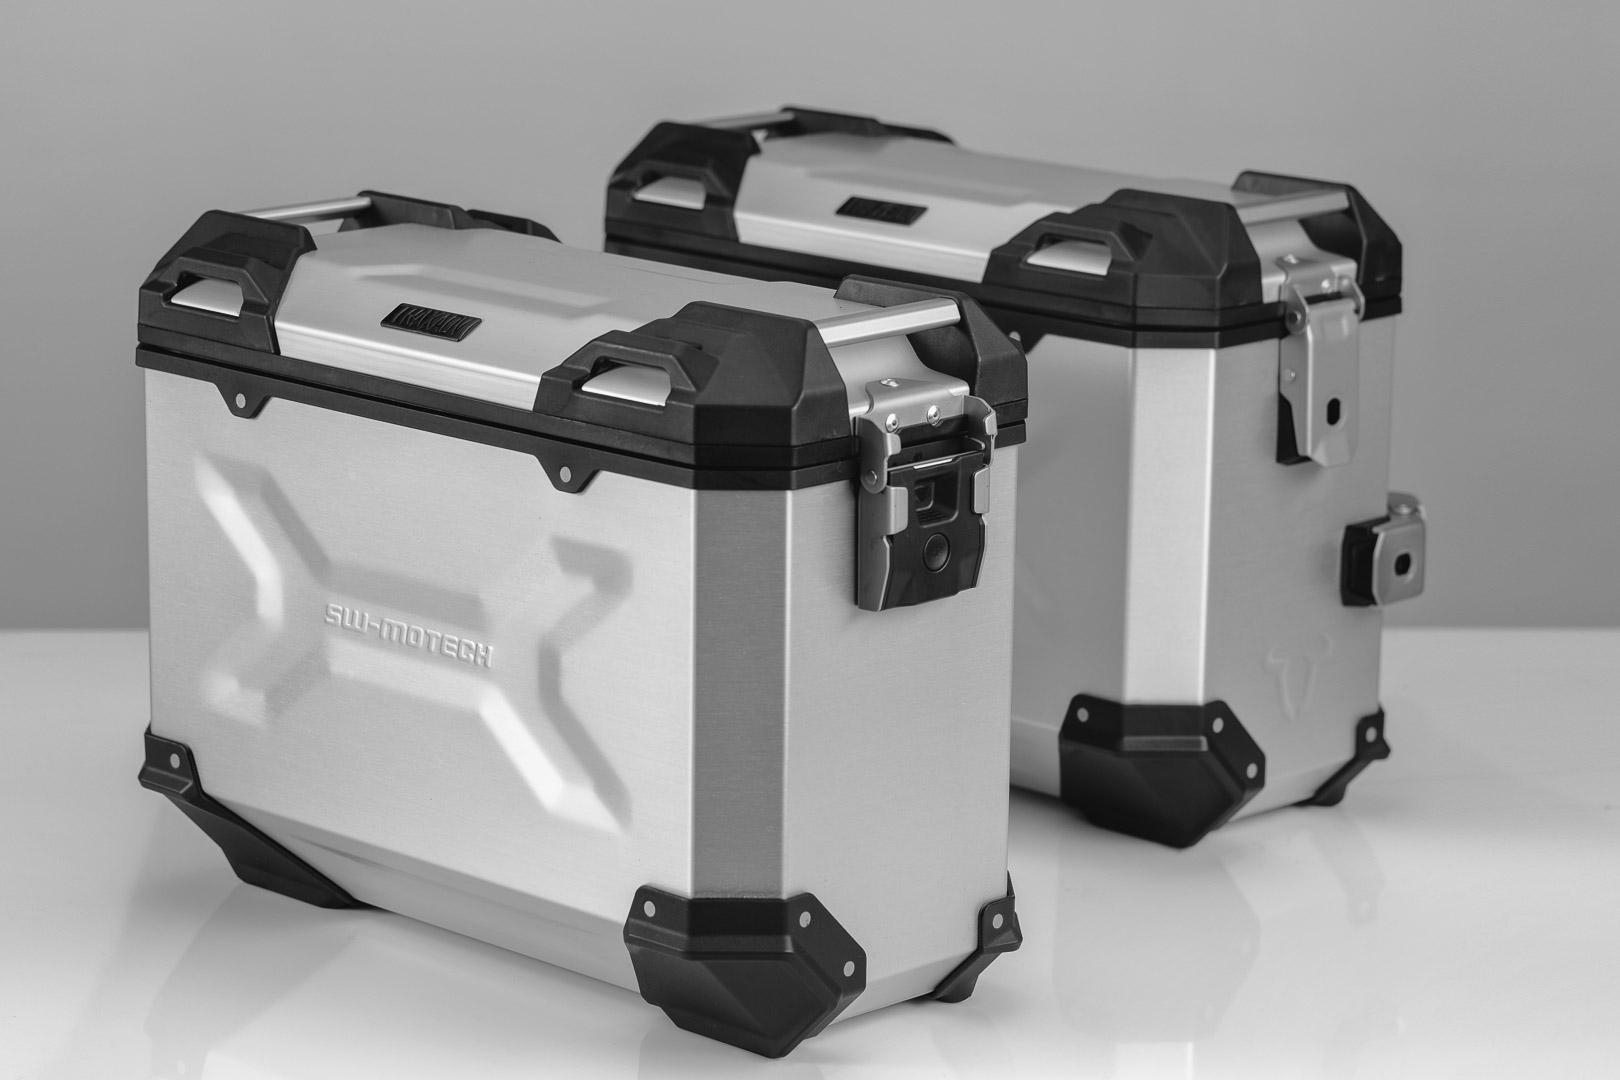 TRAX ADV Laukkupaketti, hopea, Honda Crosstourer 11-